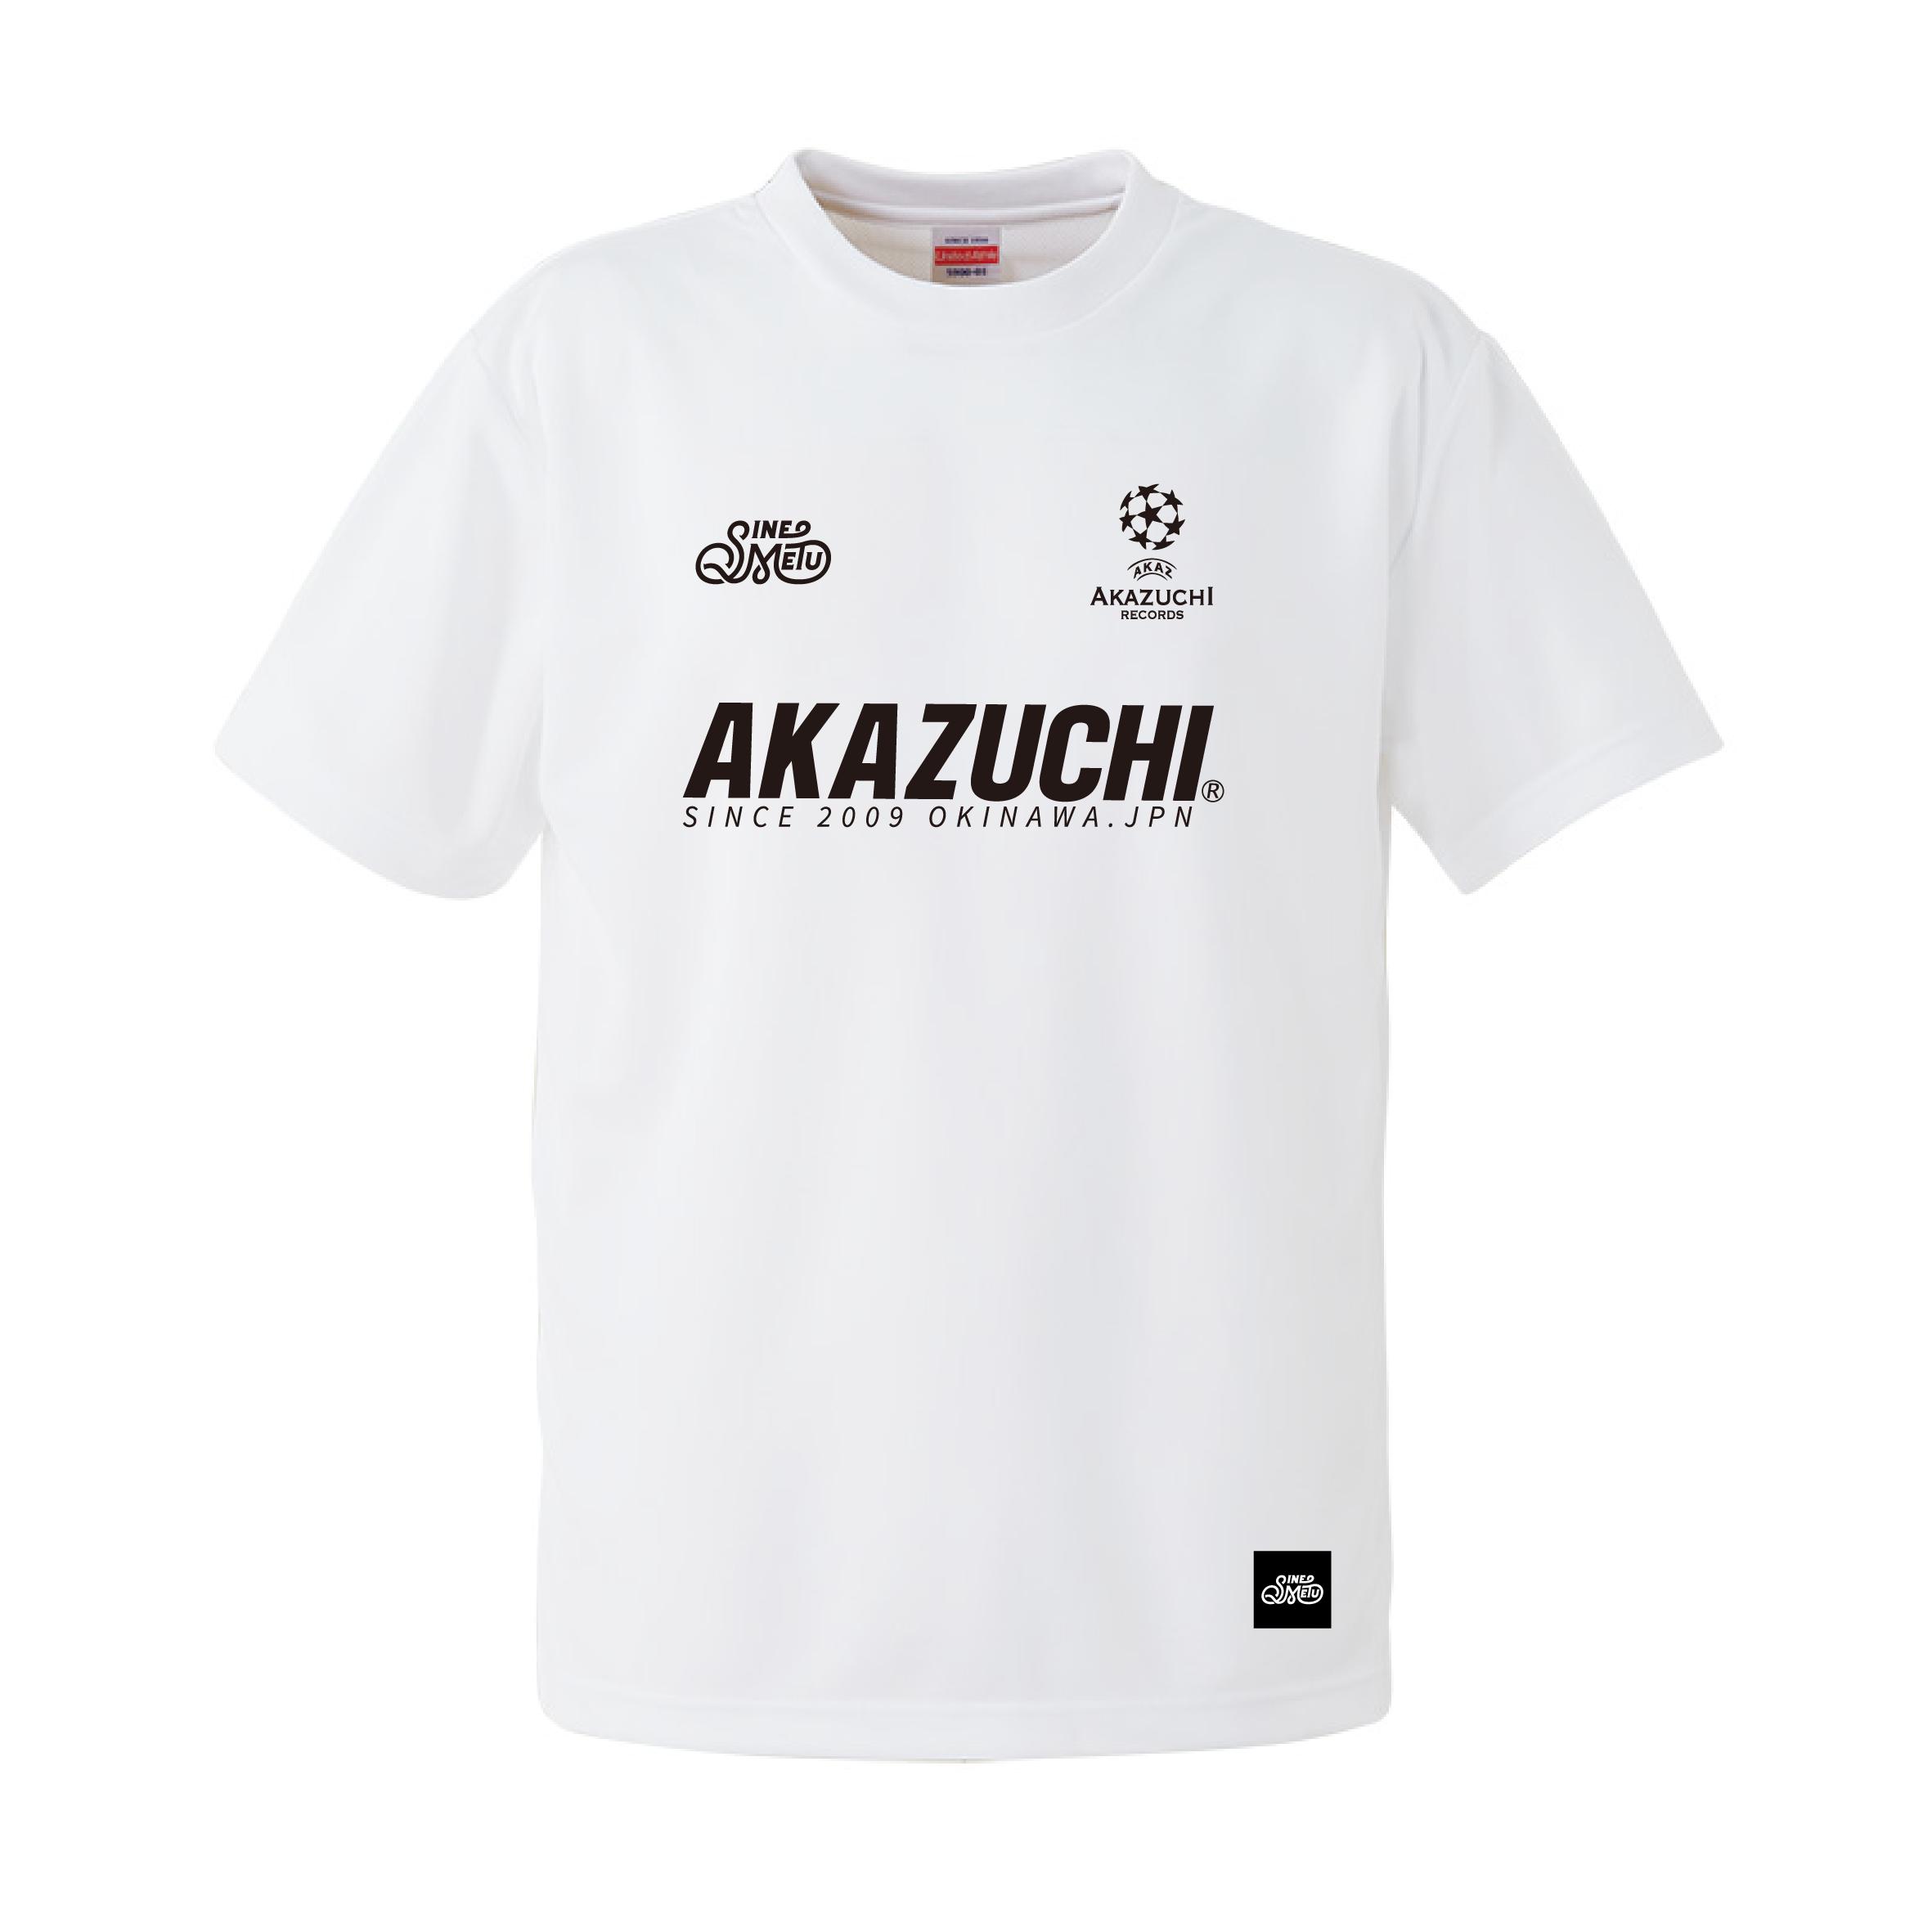 『AKAZUCHI × SINE METU』DRY TEEシャツ / ホワイト